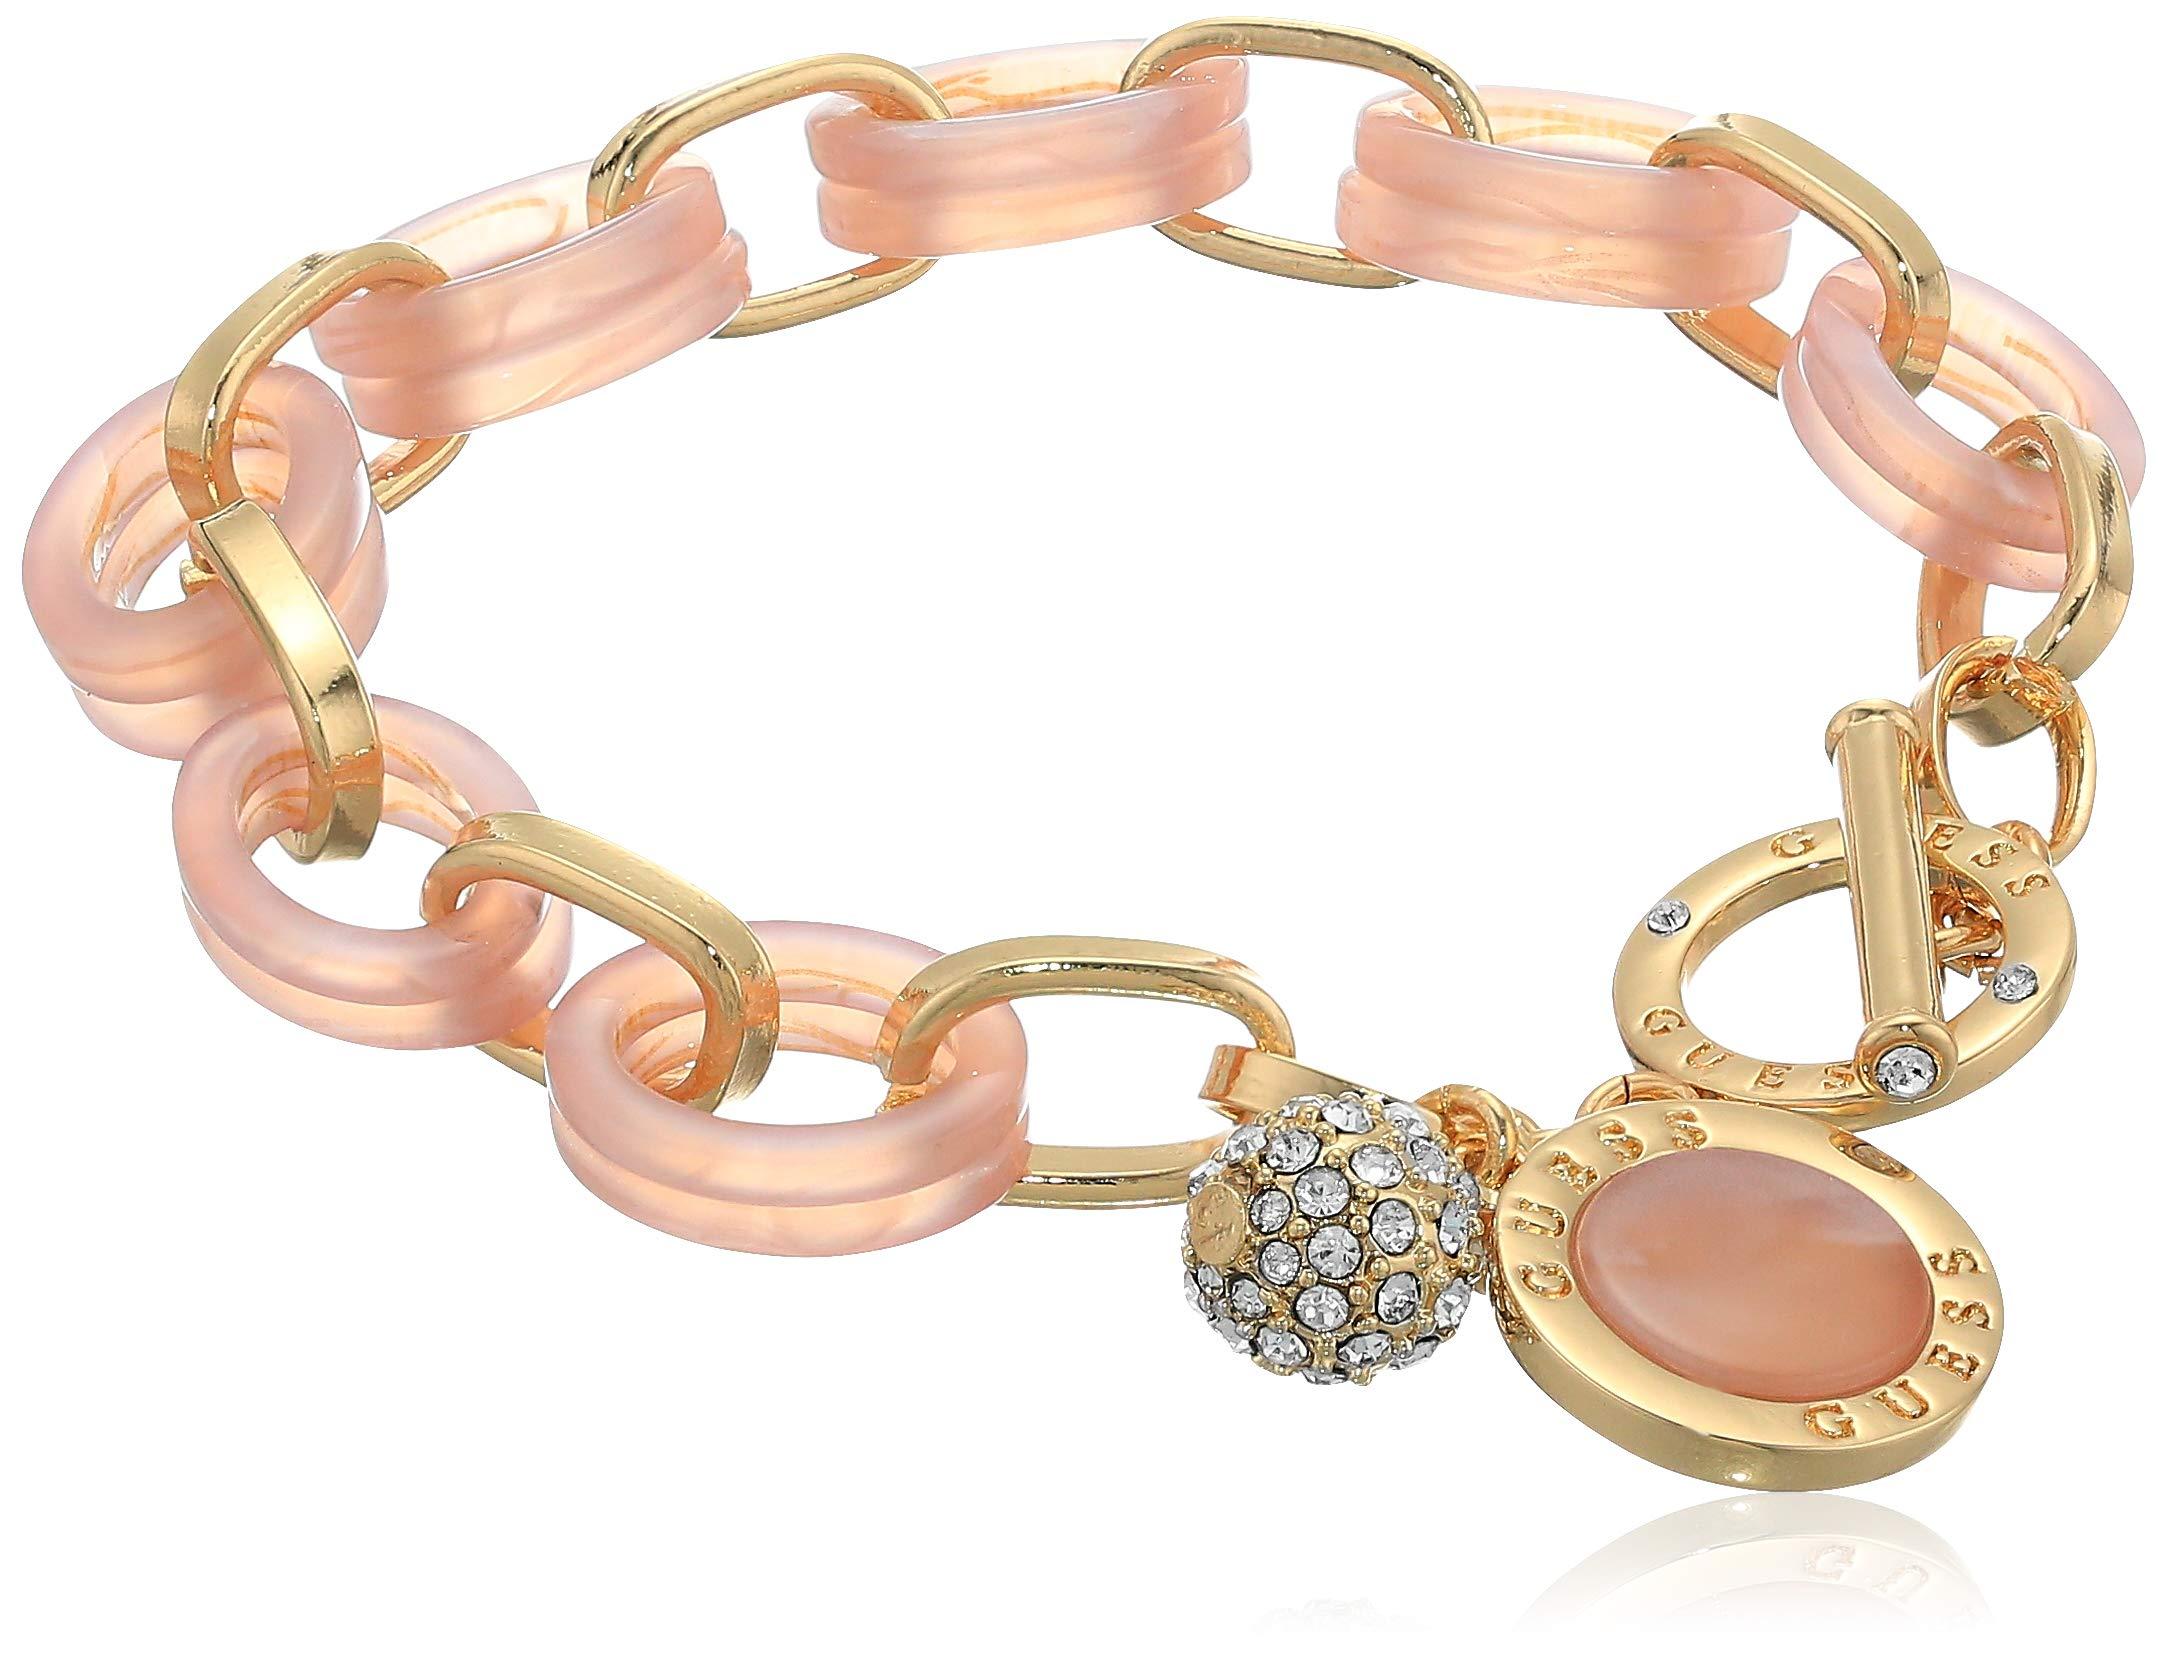 GUESS Women's Toggle Bracelet, Mauve, One Size